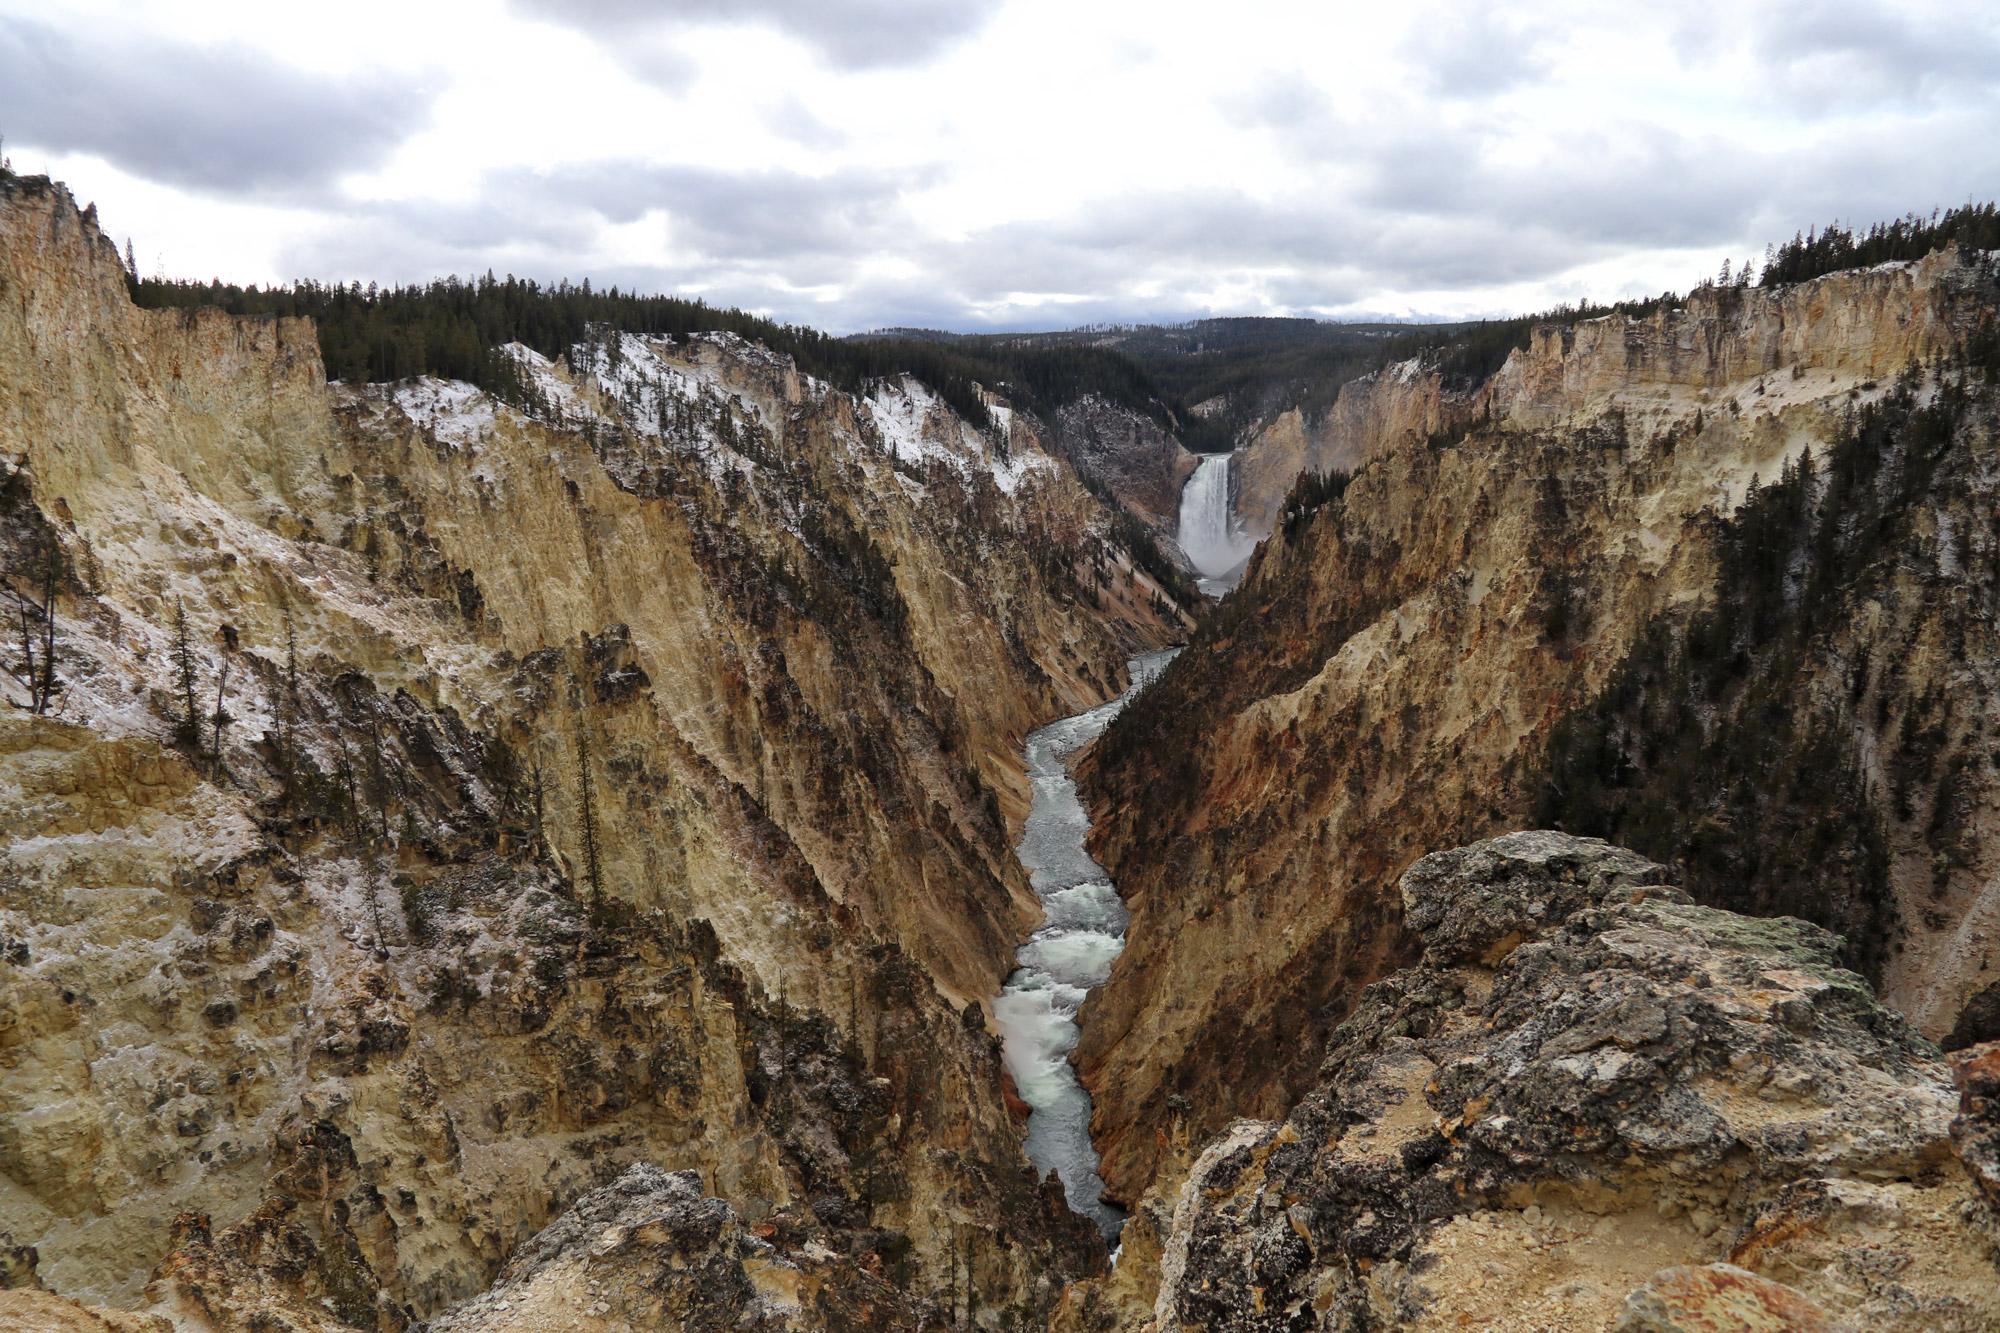 De hoogtepunten van Yellowstone National Park - Grand Canyon van Yellowstone